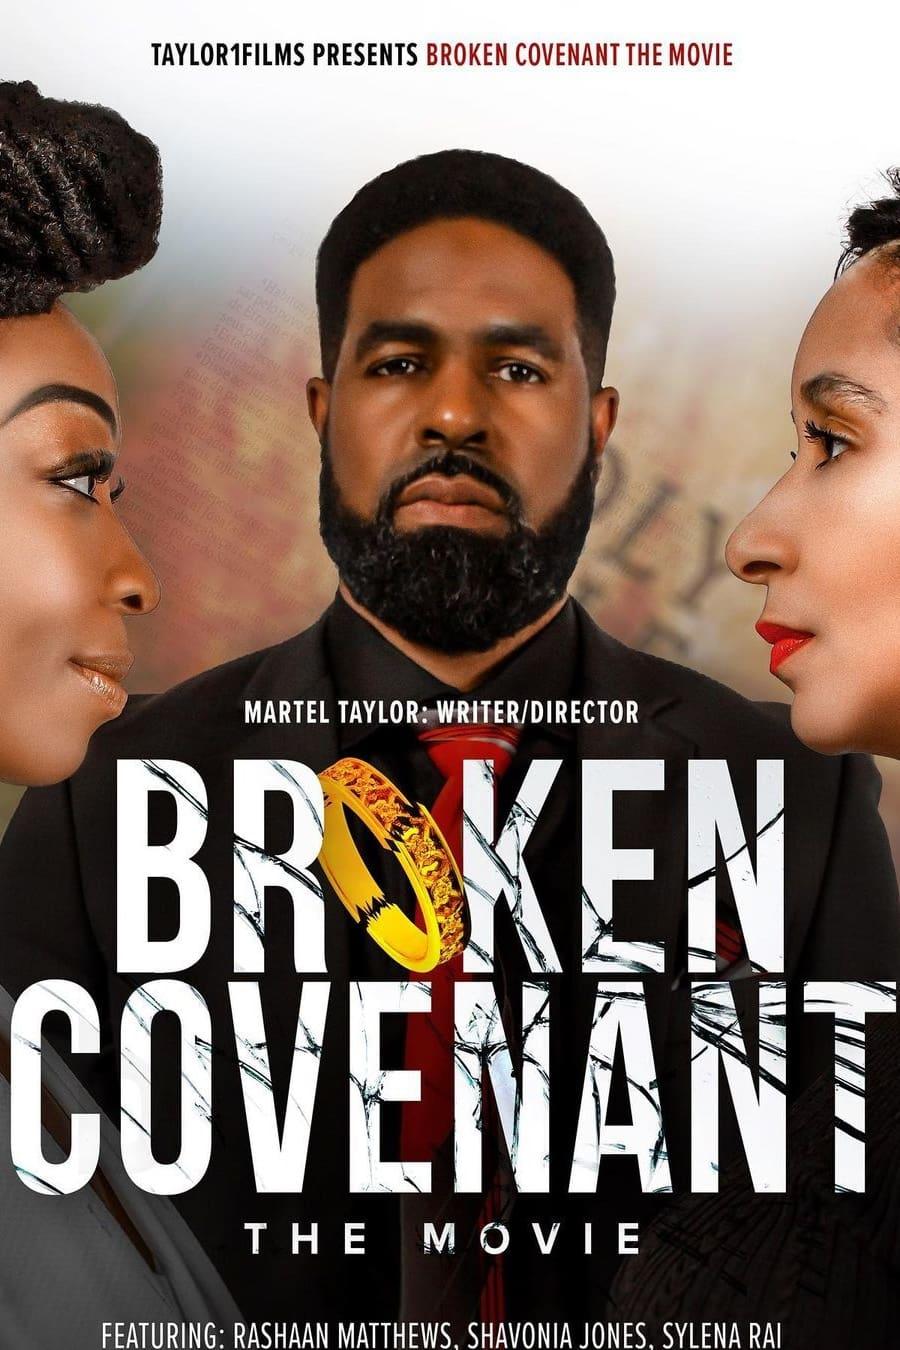 Broken Covenant The Movie (2021)